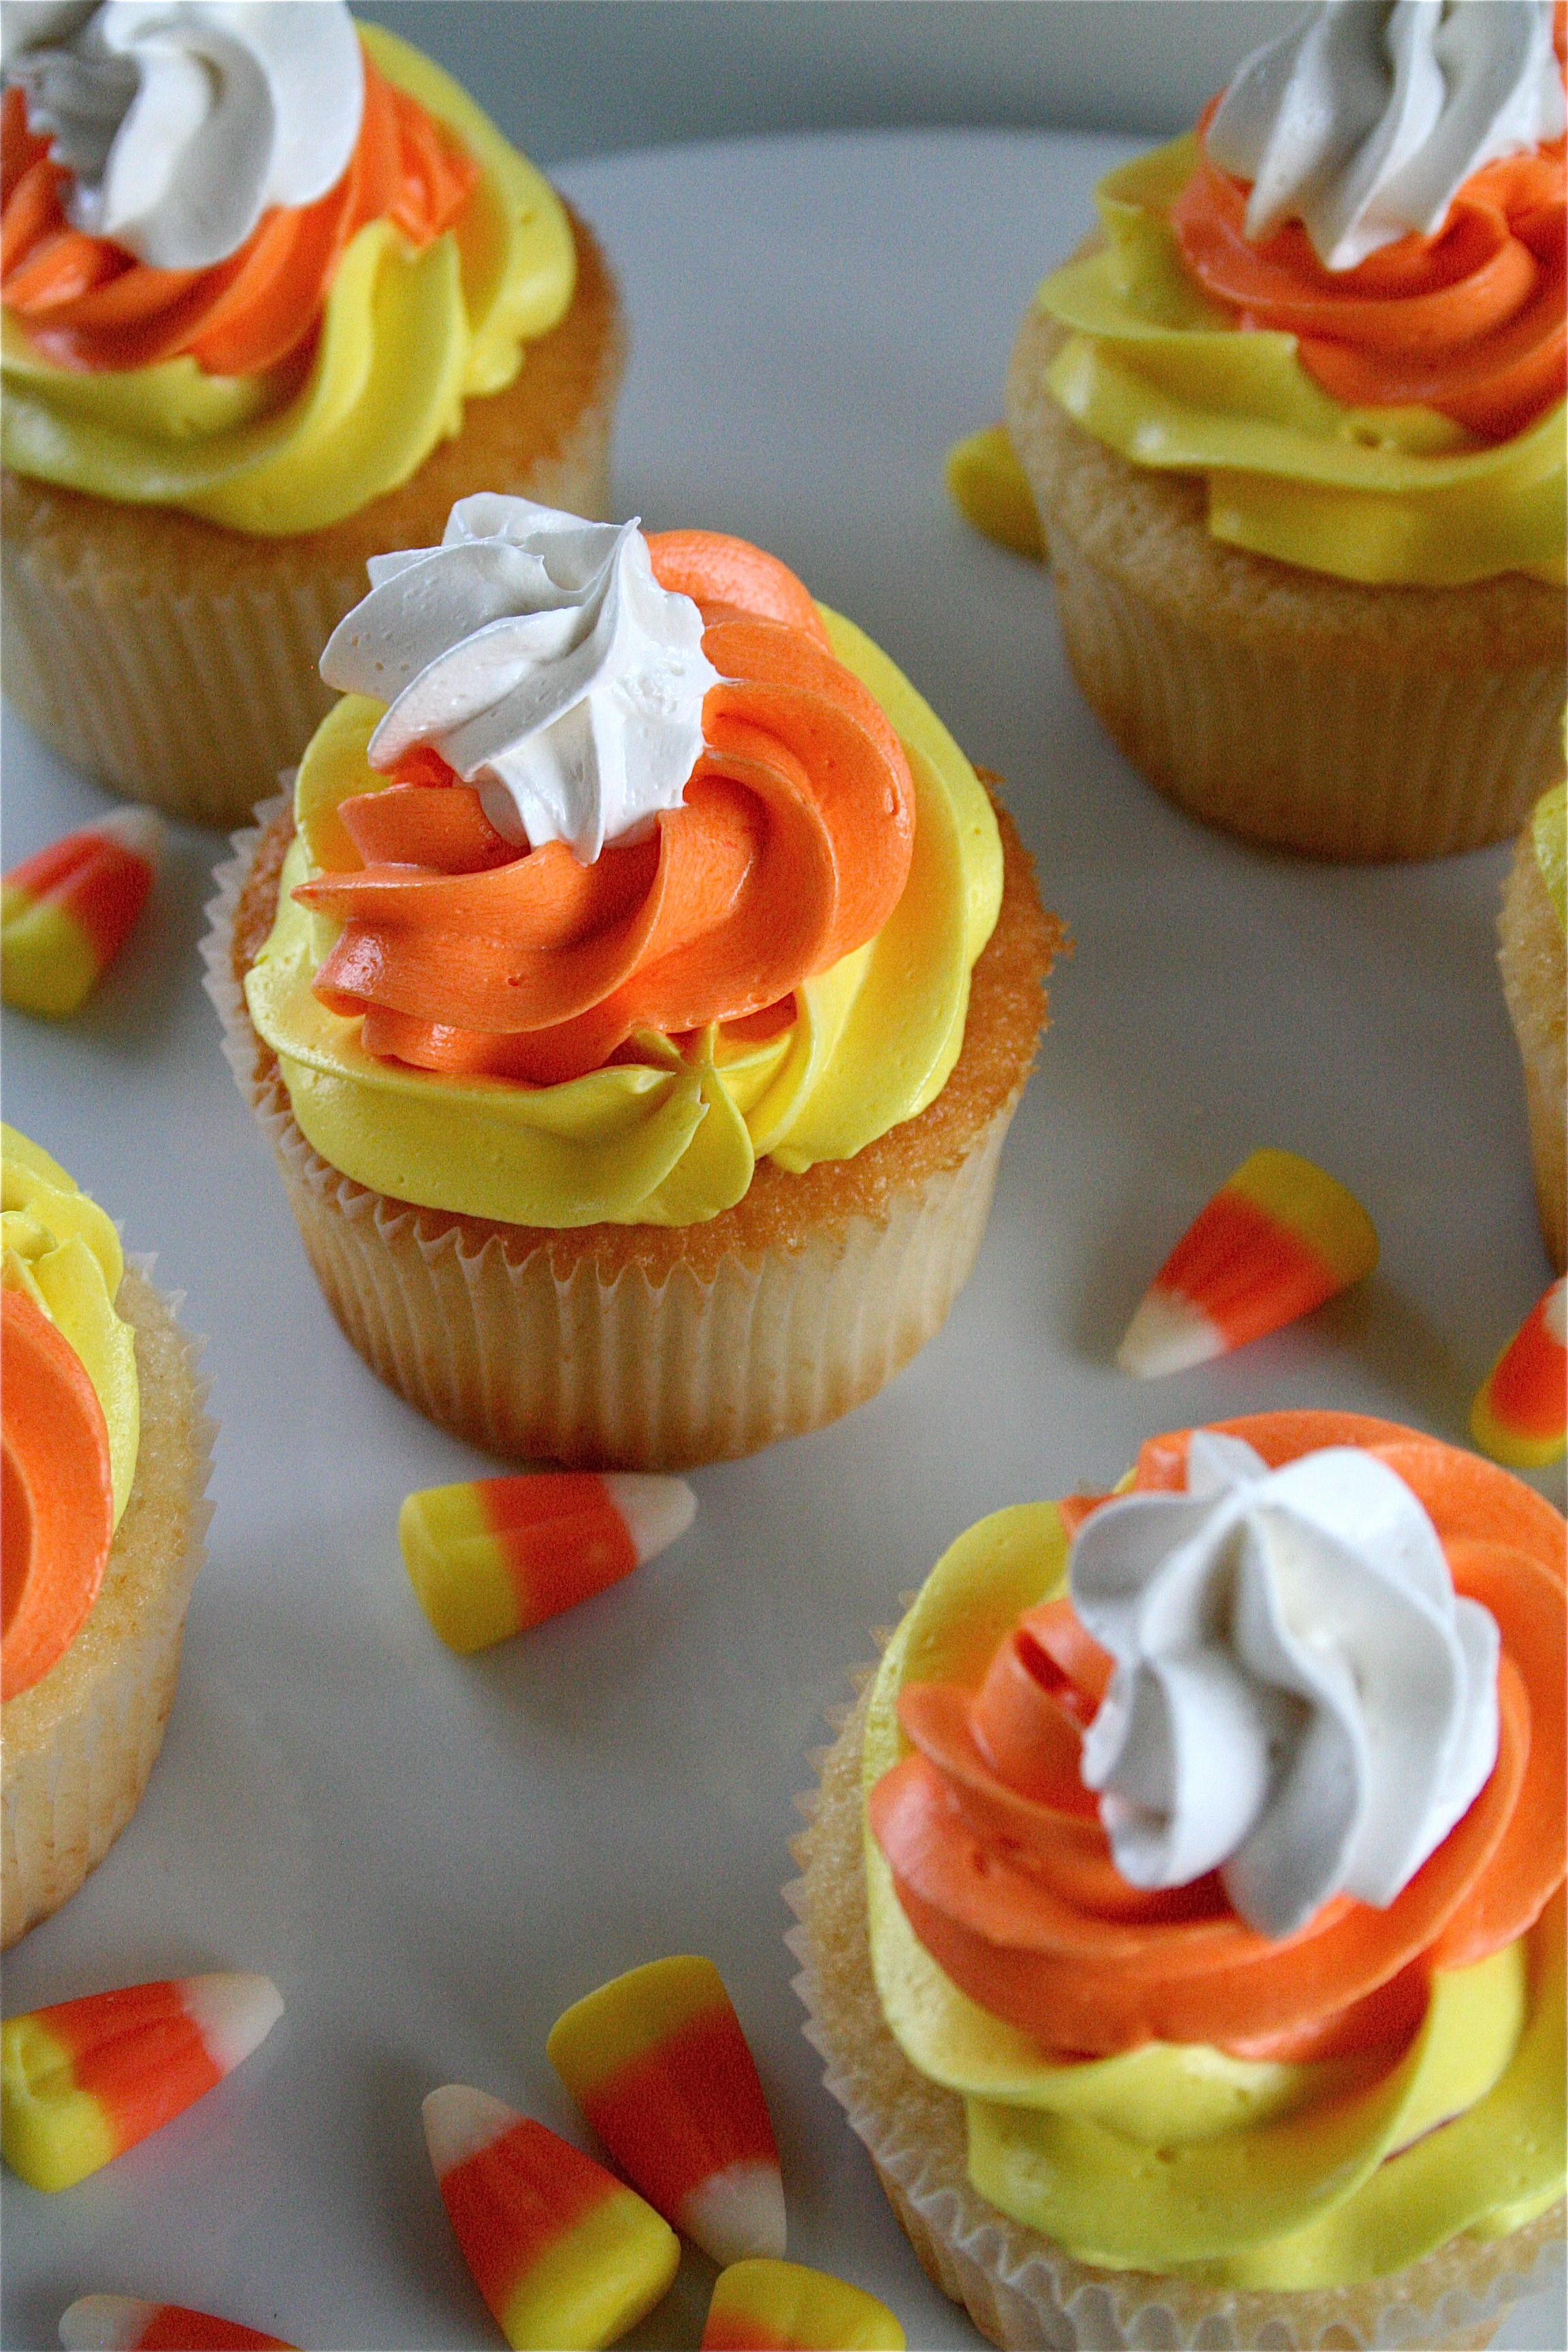 Chocolate Halloween Cupcakes  28 Cute Halloween Cupcakes Easy Recipes for Halloween